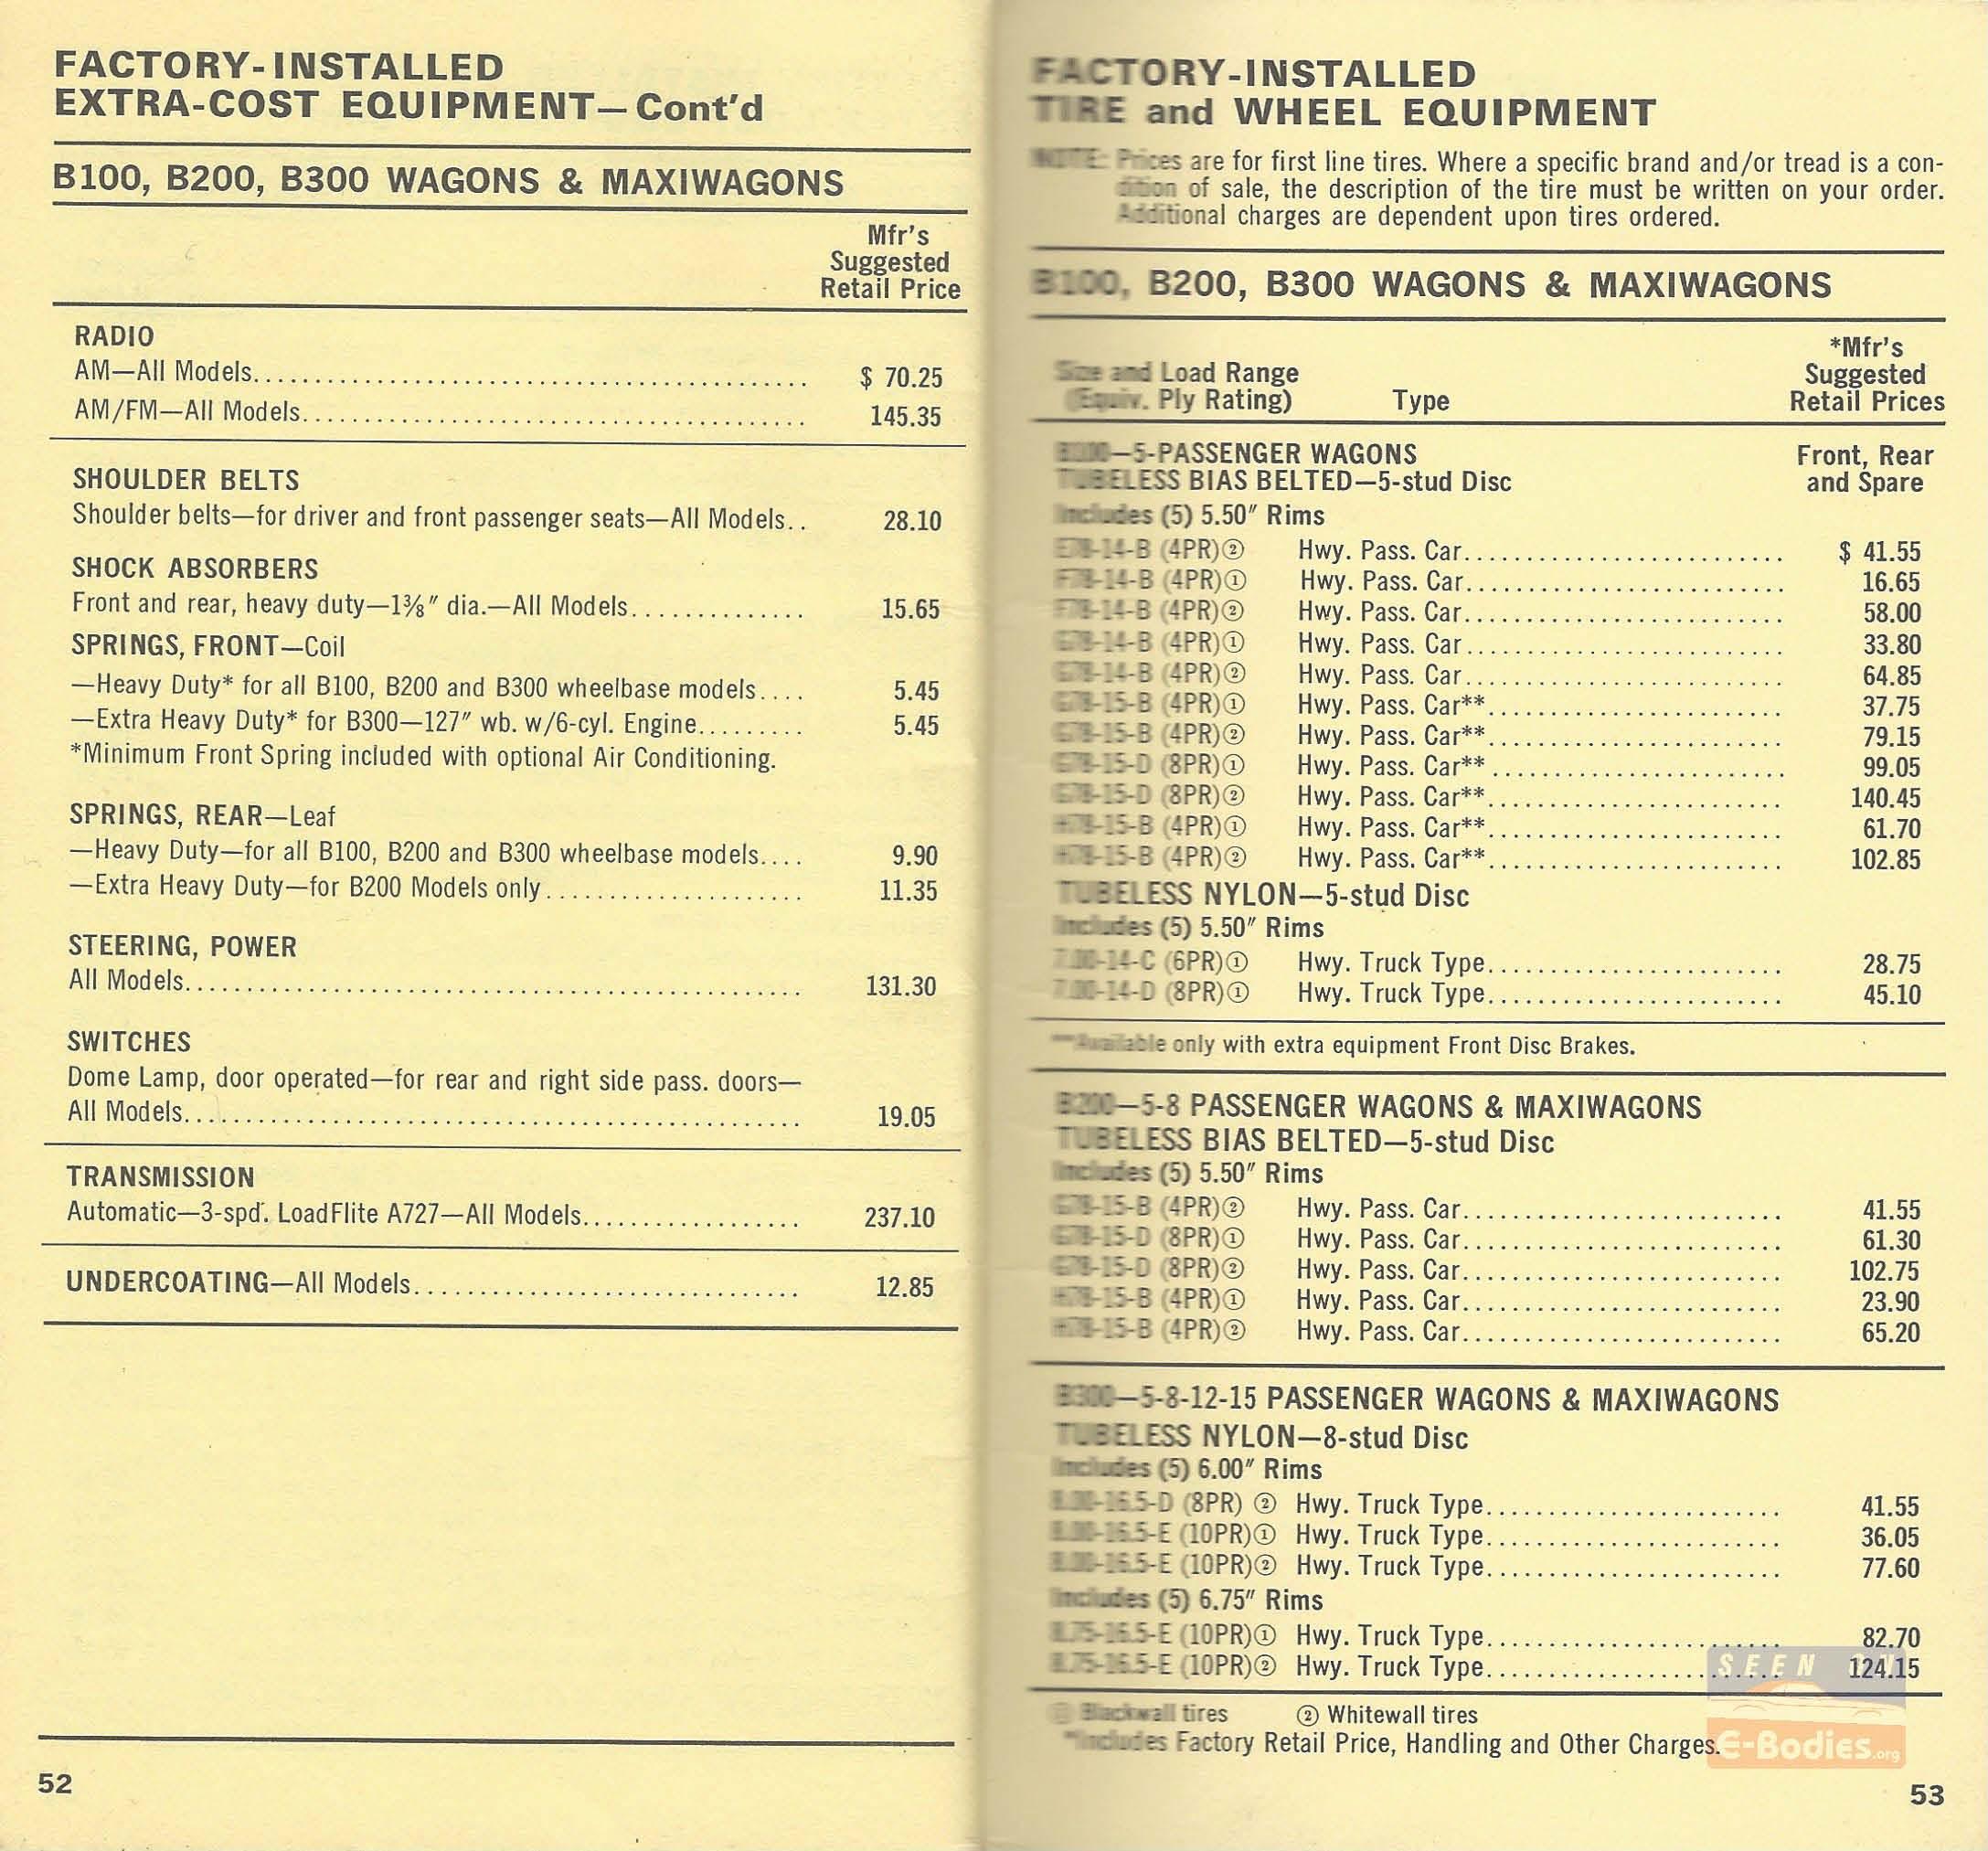 1972 Dodge Salesman Models & Equipment Prices Sportsman – E-Bodies